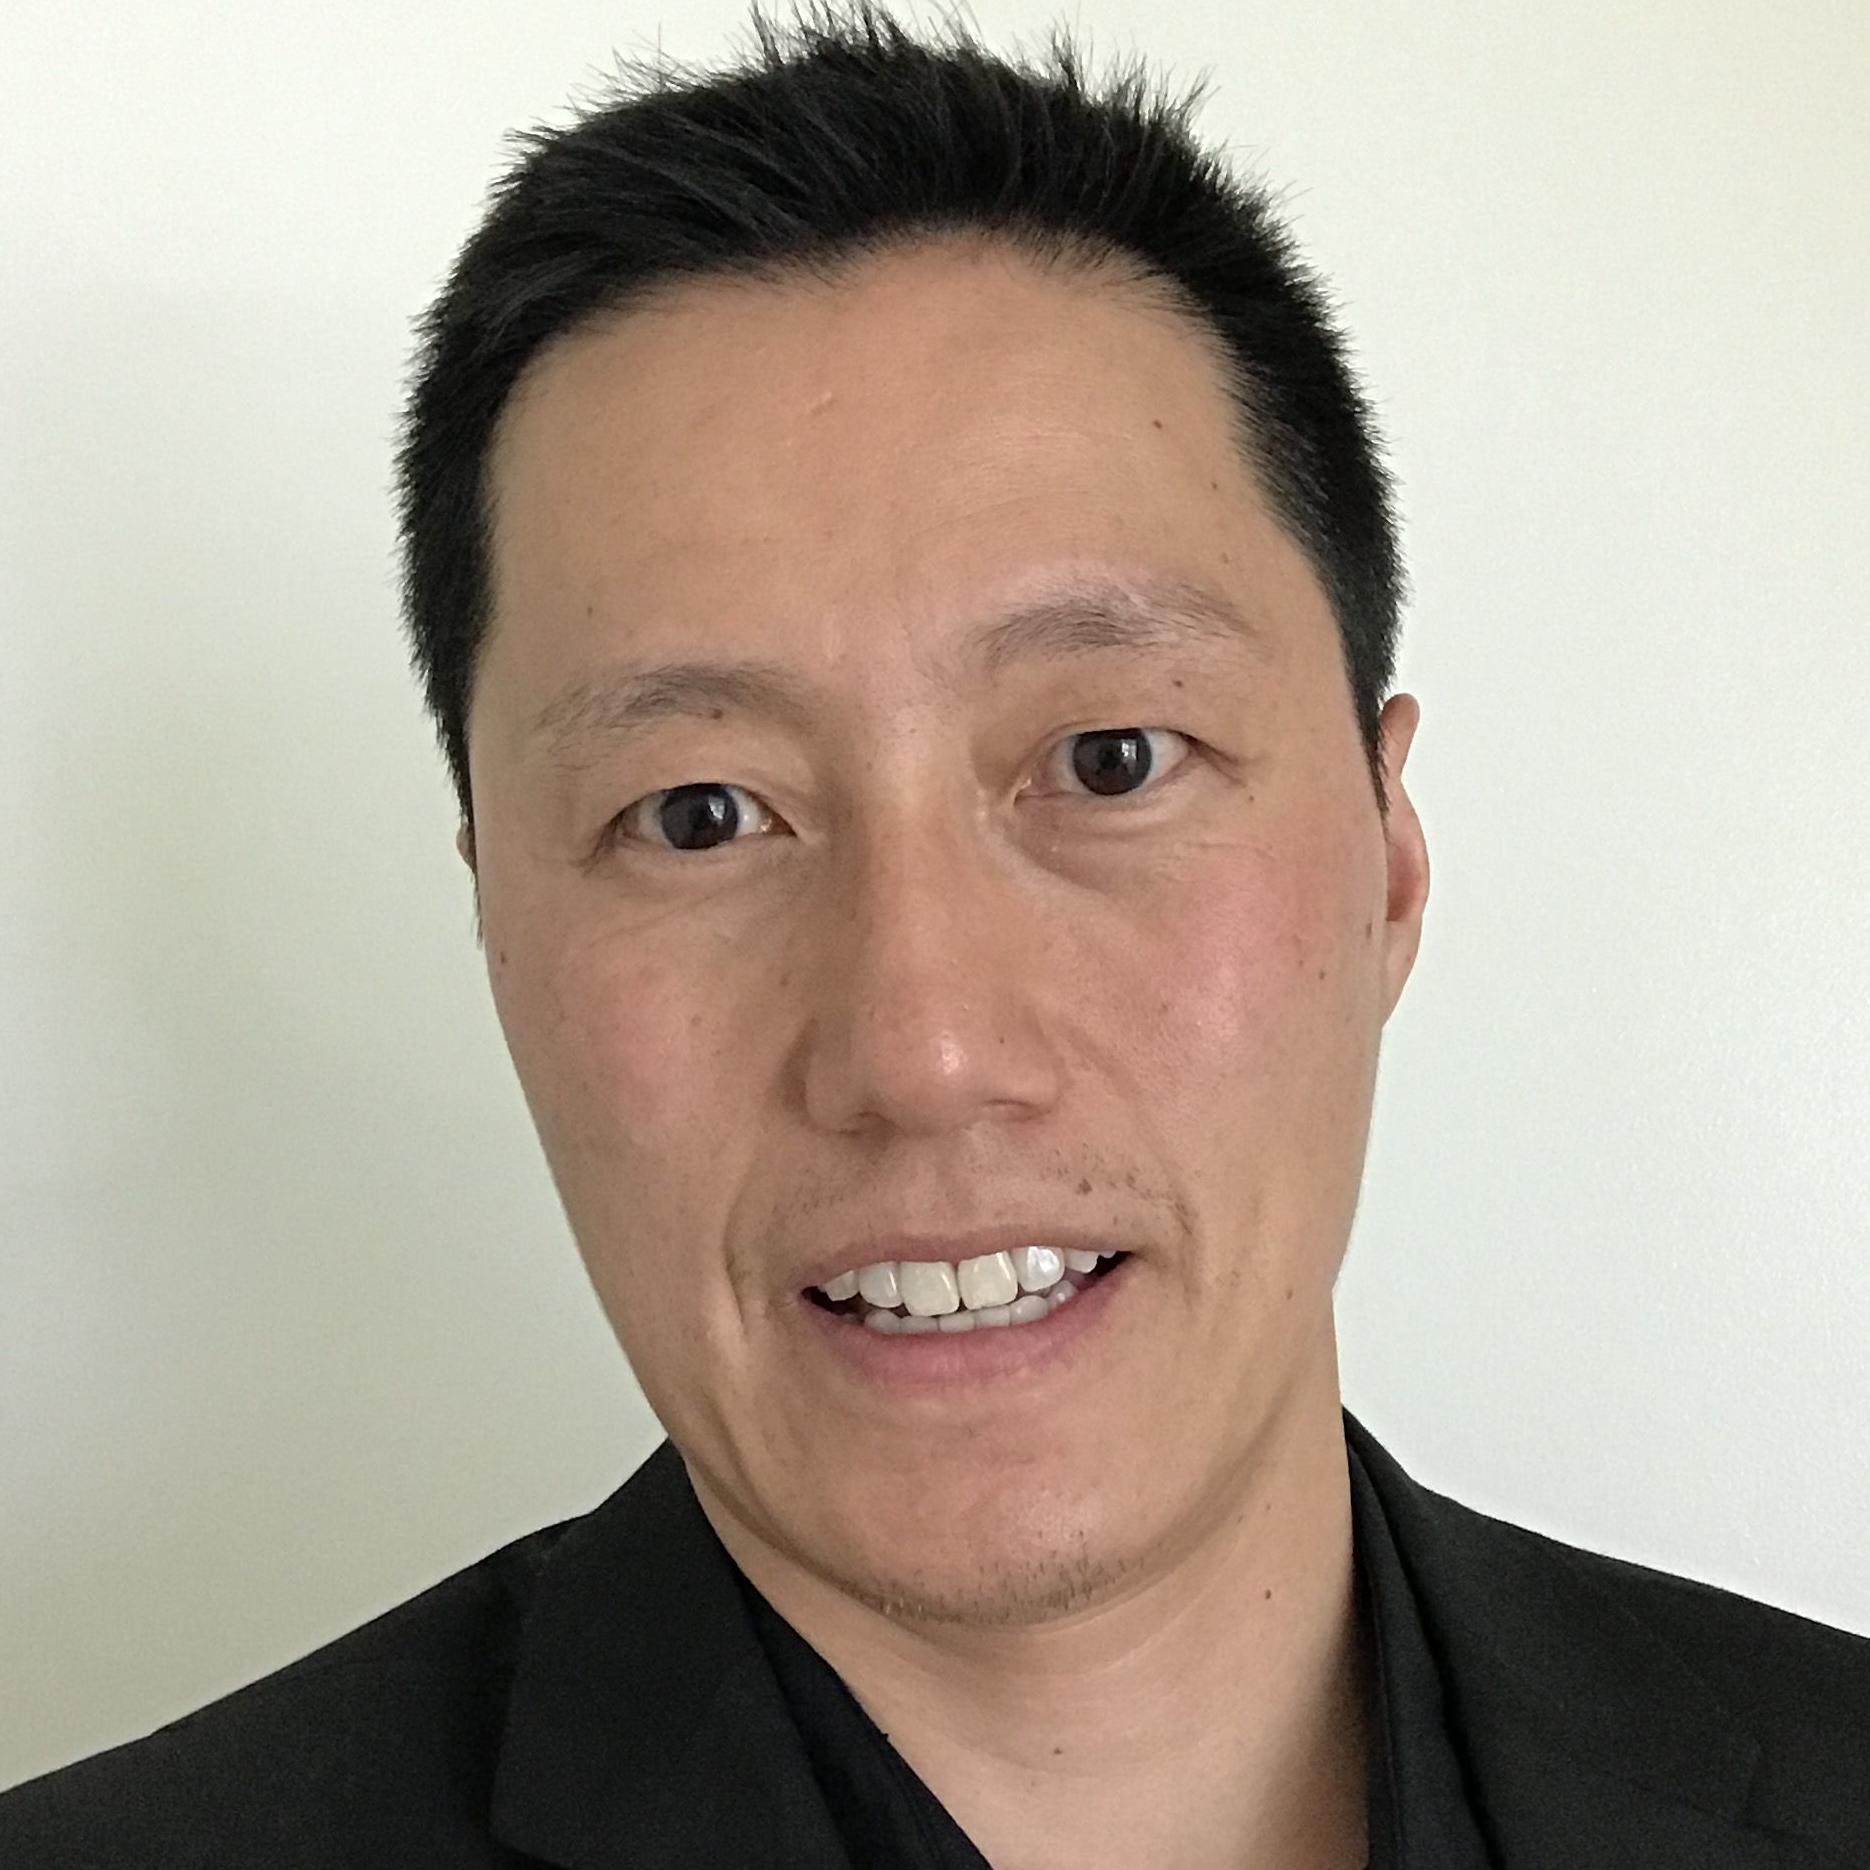 Paul Hsu from Decasonic